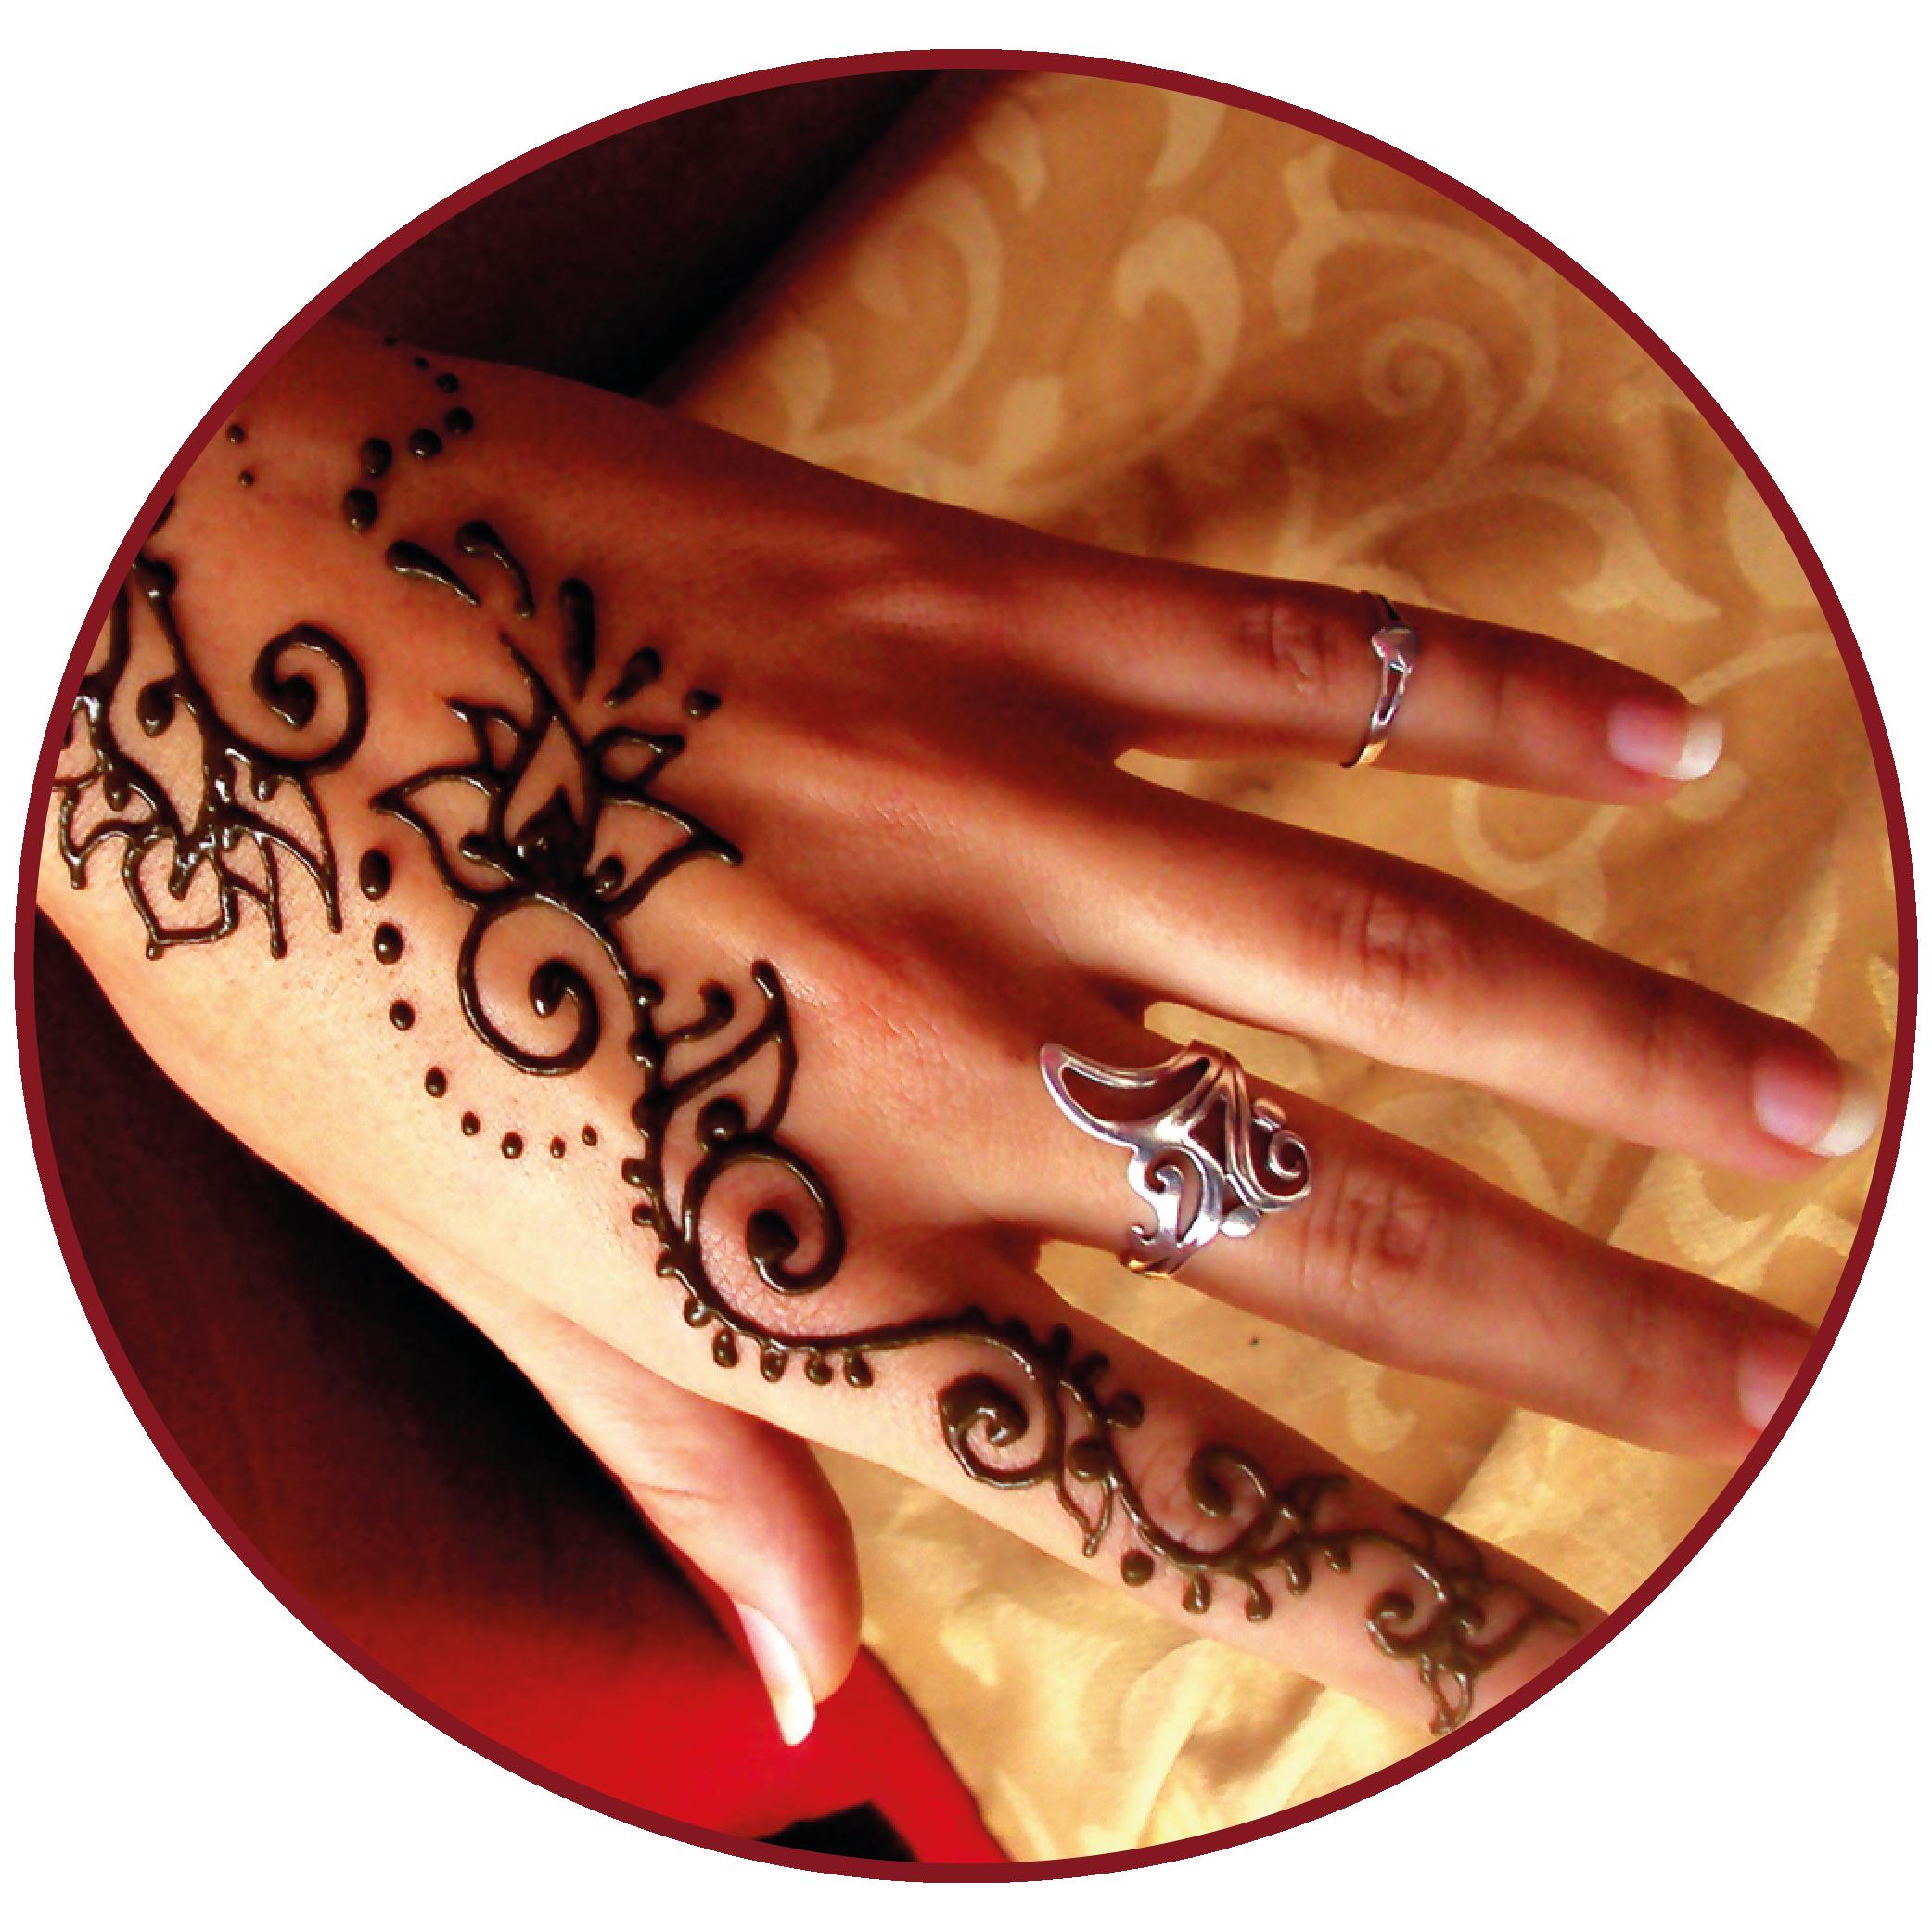 Shri-Website-Services-Images3-03